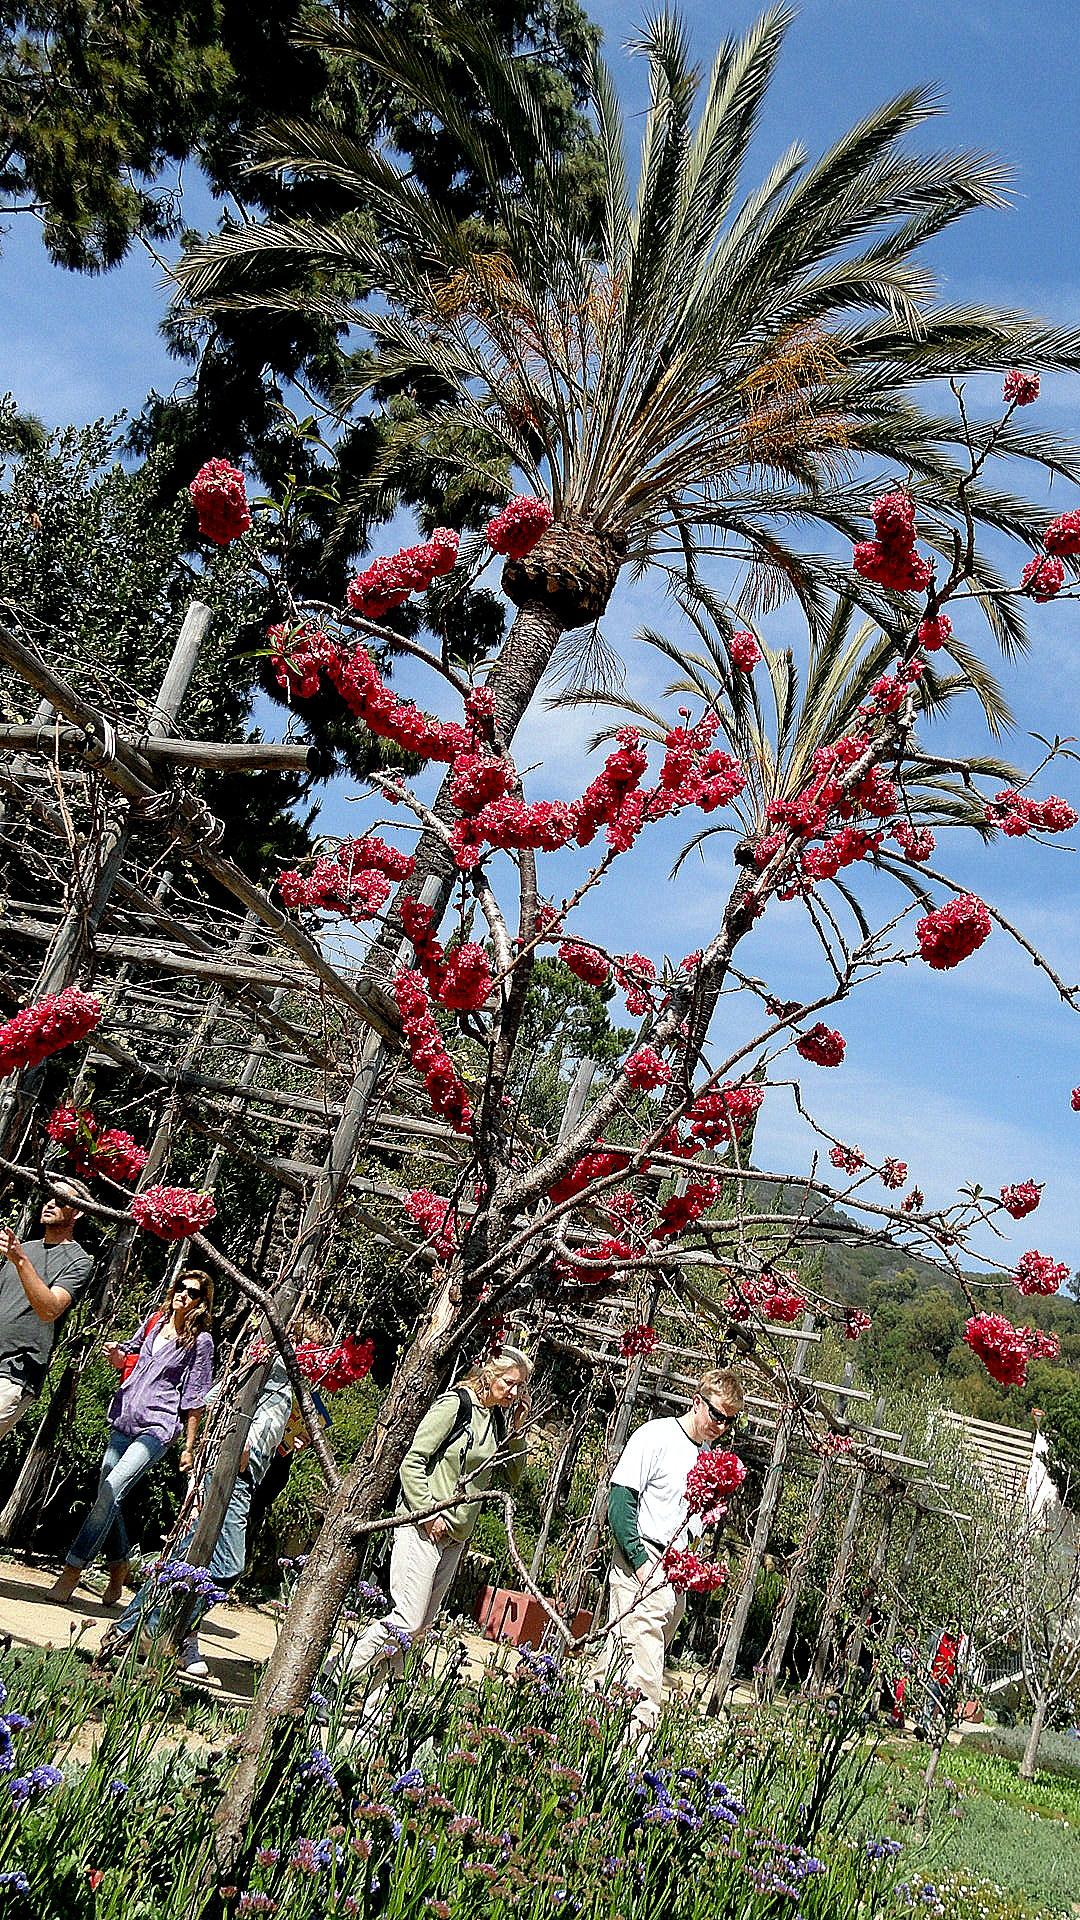 Flowers & Trees in Getty Villa Herb Garden